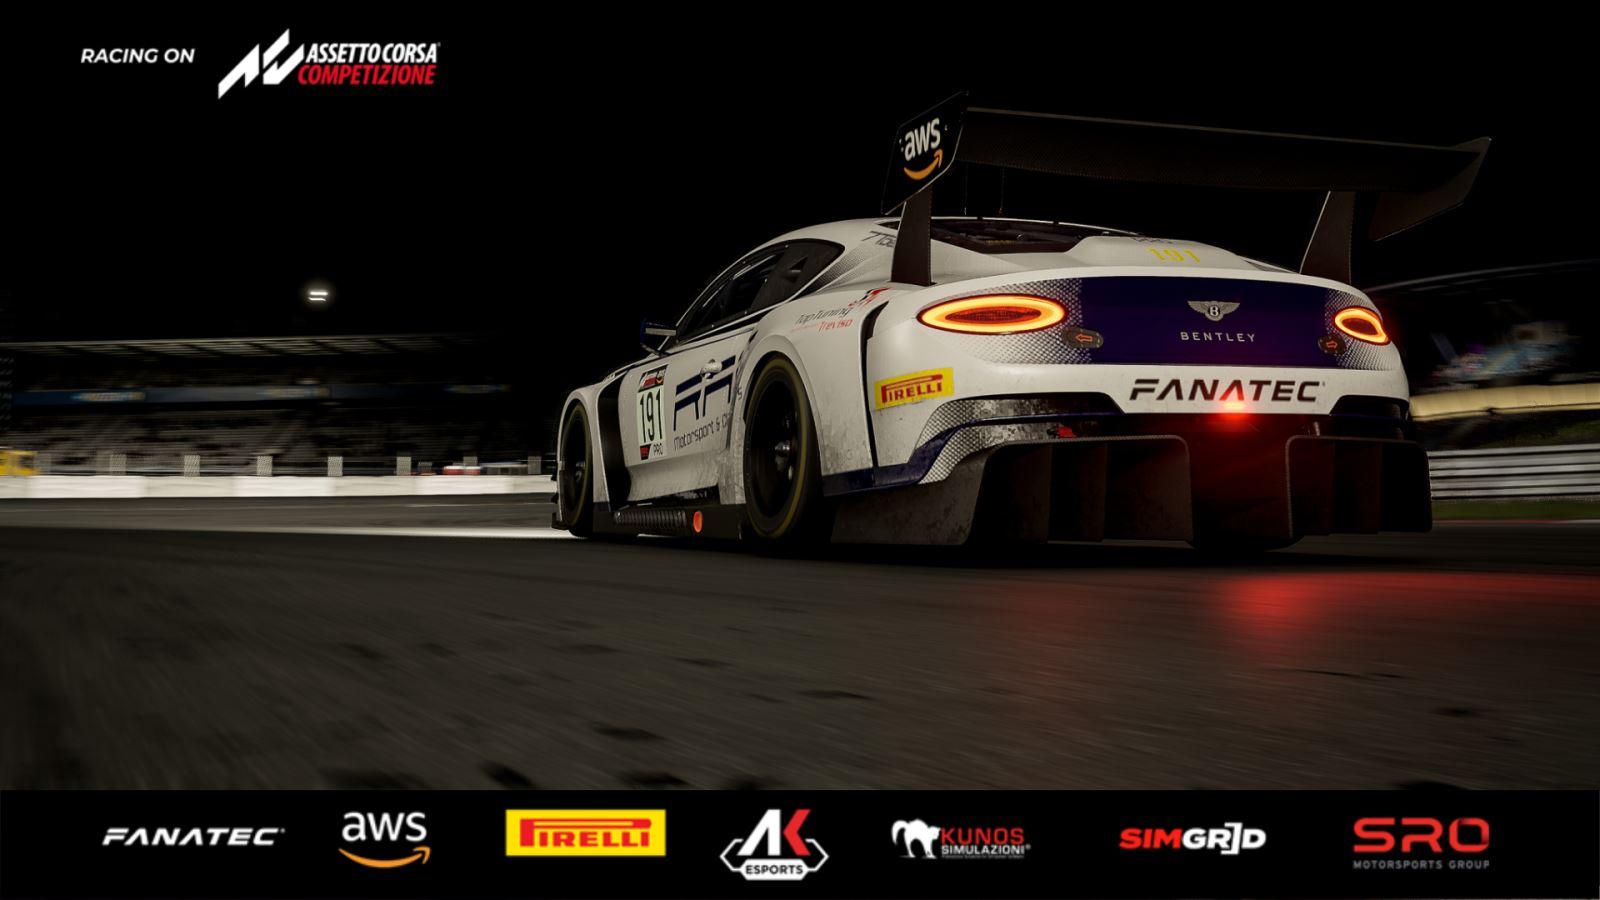 SRO E-sports - Racing Line Motorsport secures sensational comeback victory in Endurance Series thriller at the Nürburgring